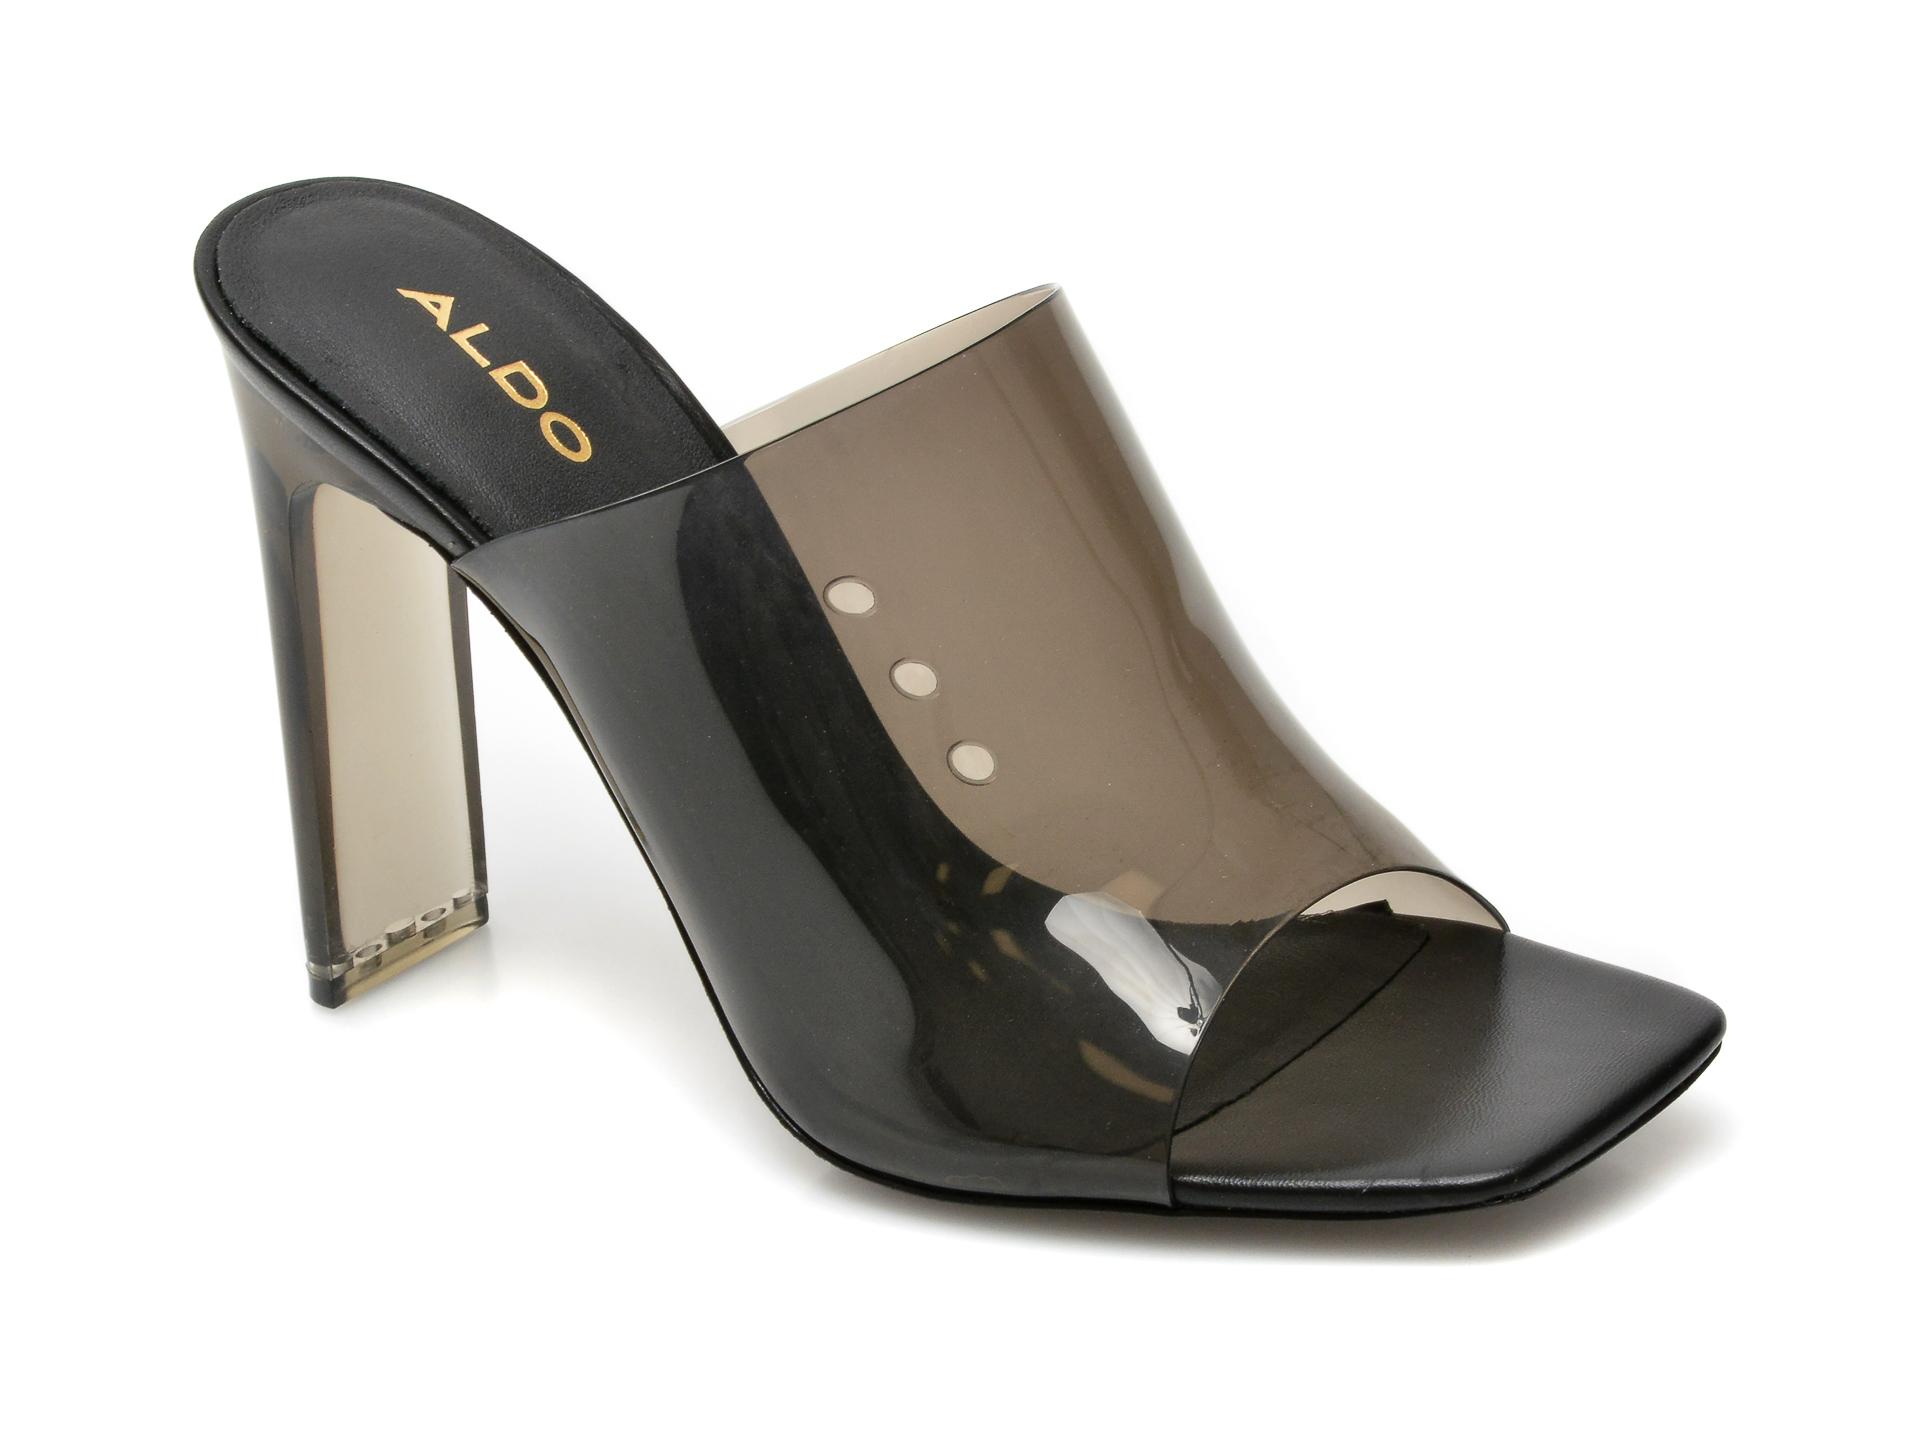 Papuci ALDO negre, Ybendaviel001, din pvc